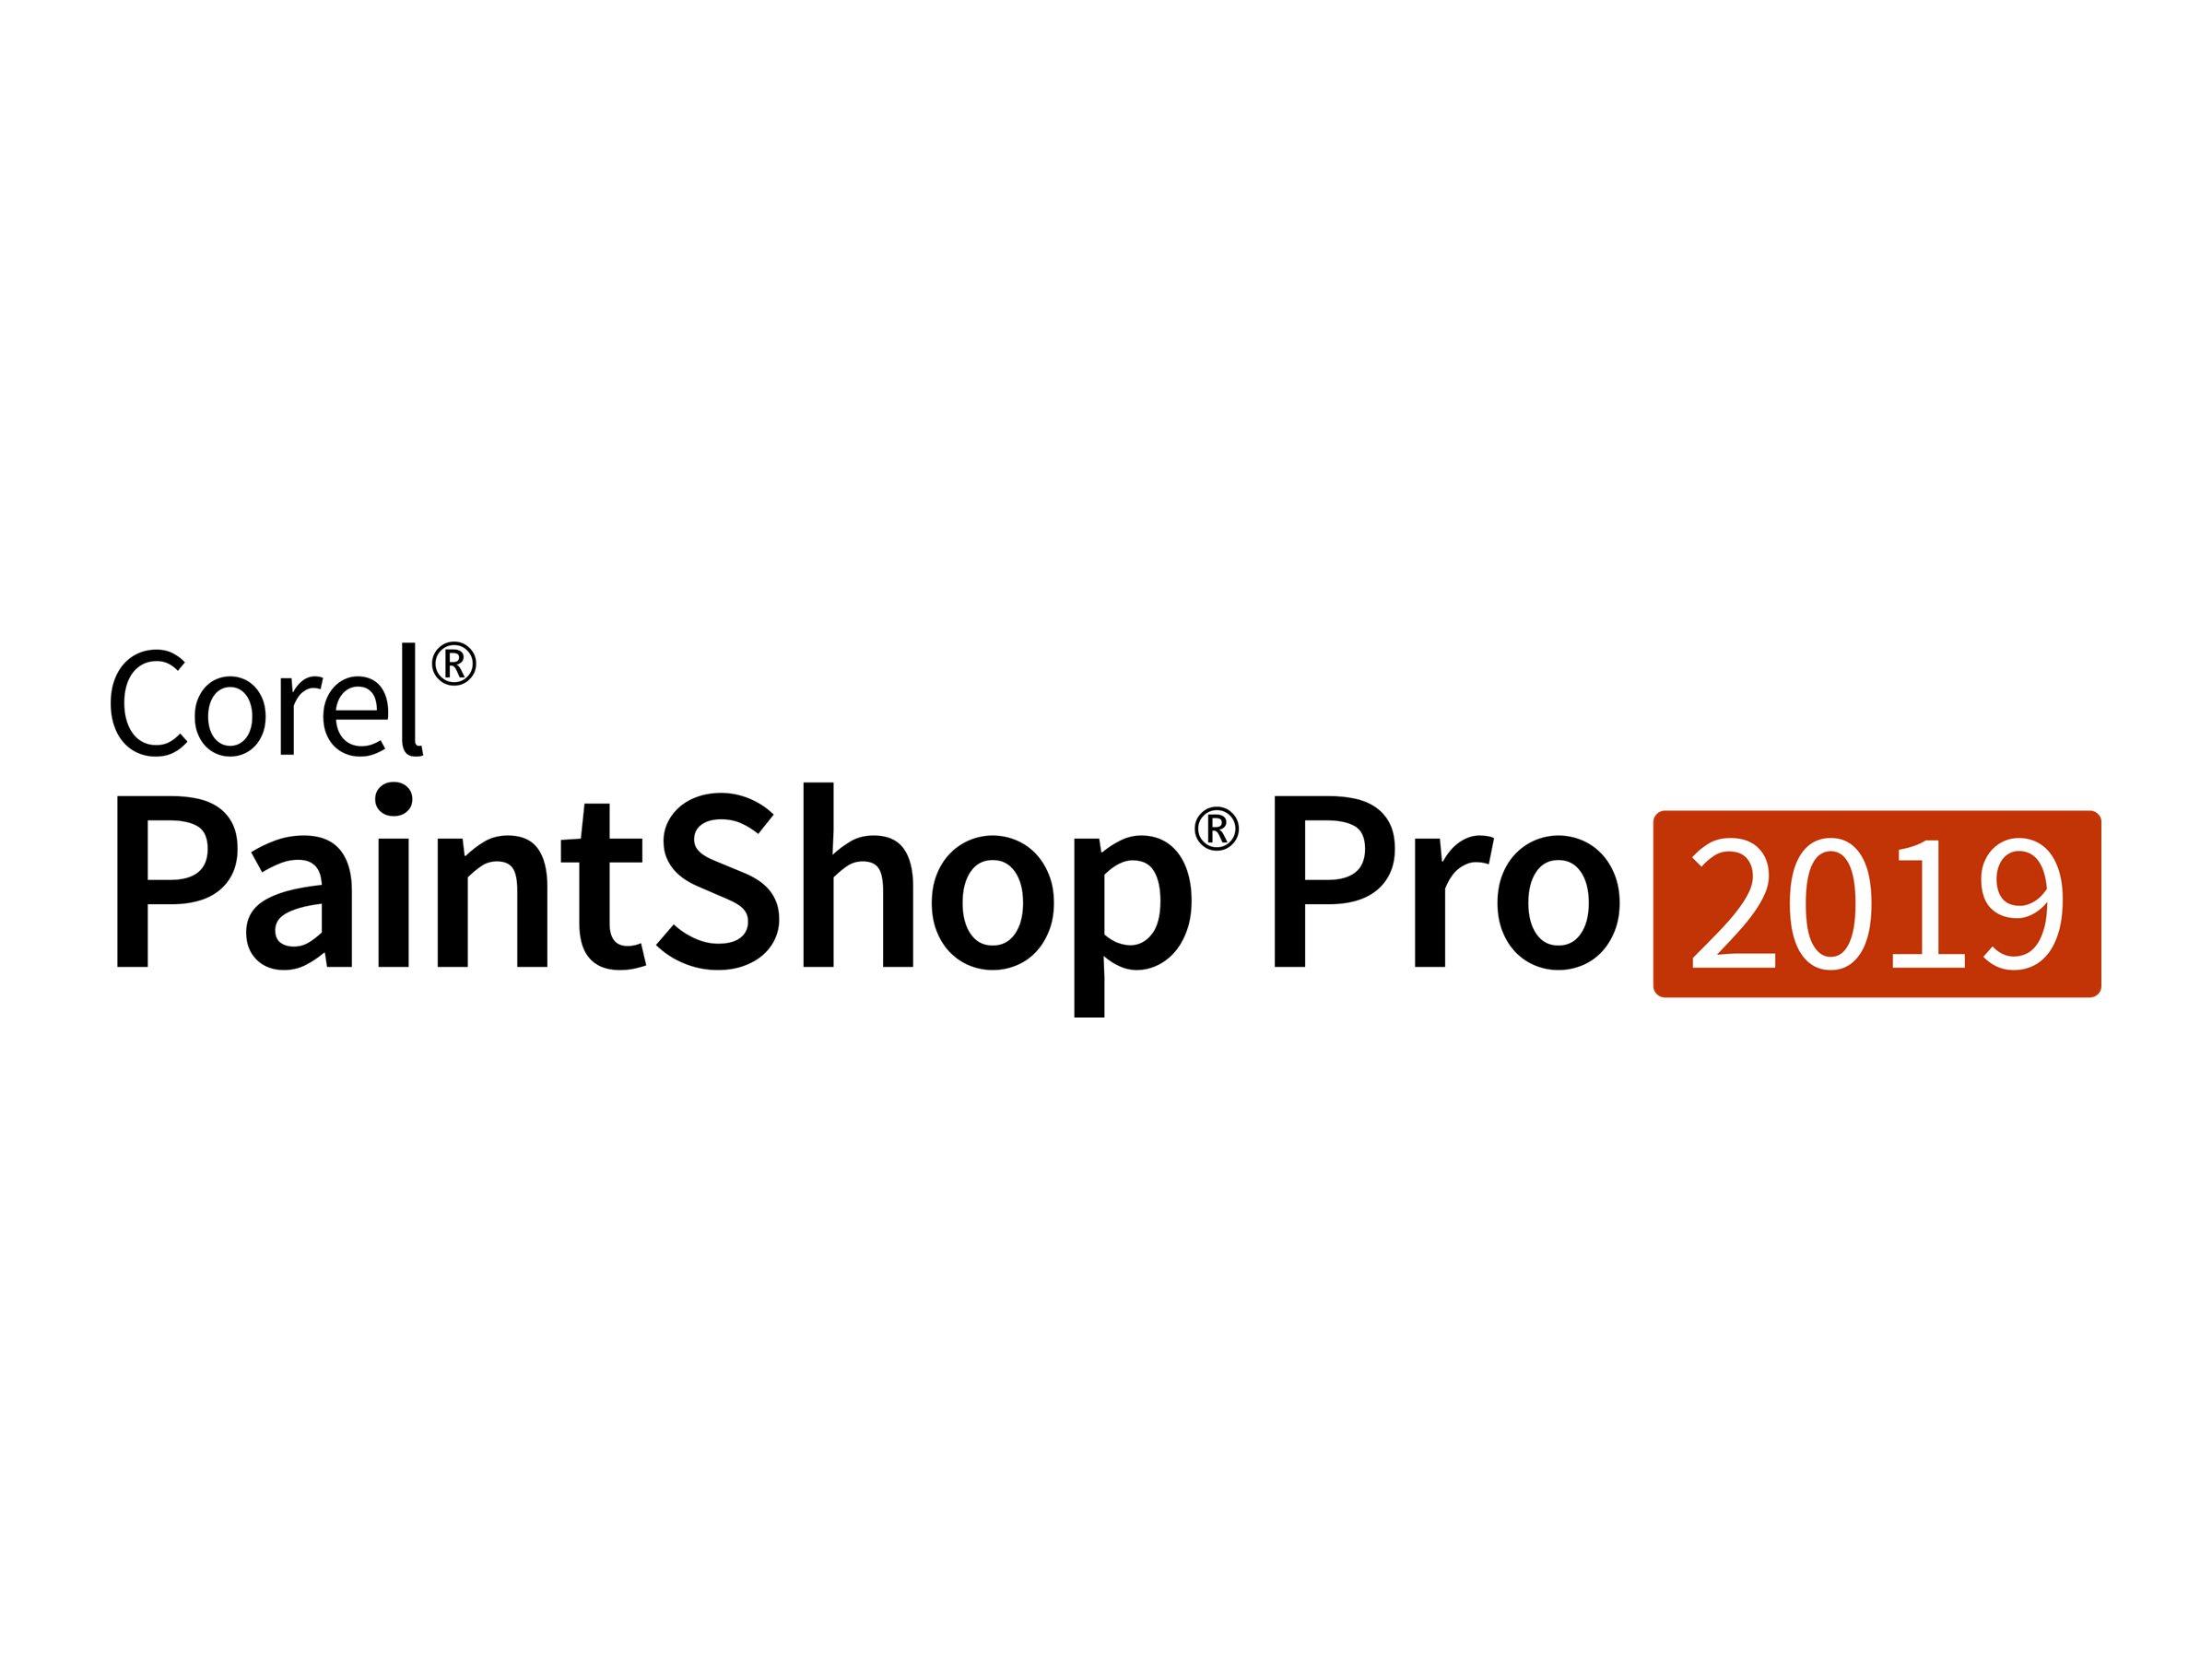 Corel PaintShop Pro 2019 - Upgrade-Lizenz - 1 Benutzer - Corporate / Unternehmens- - Win - Multi-Lingual